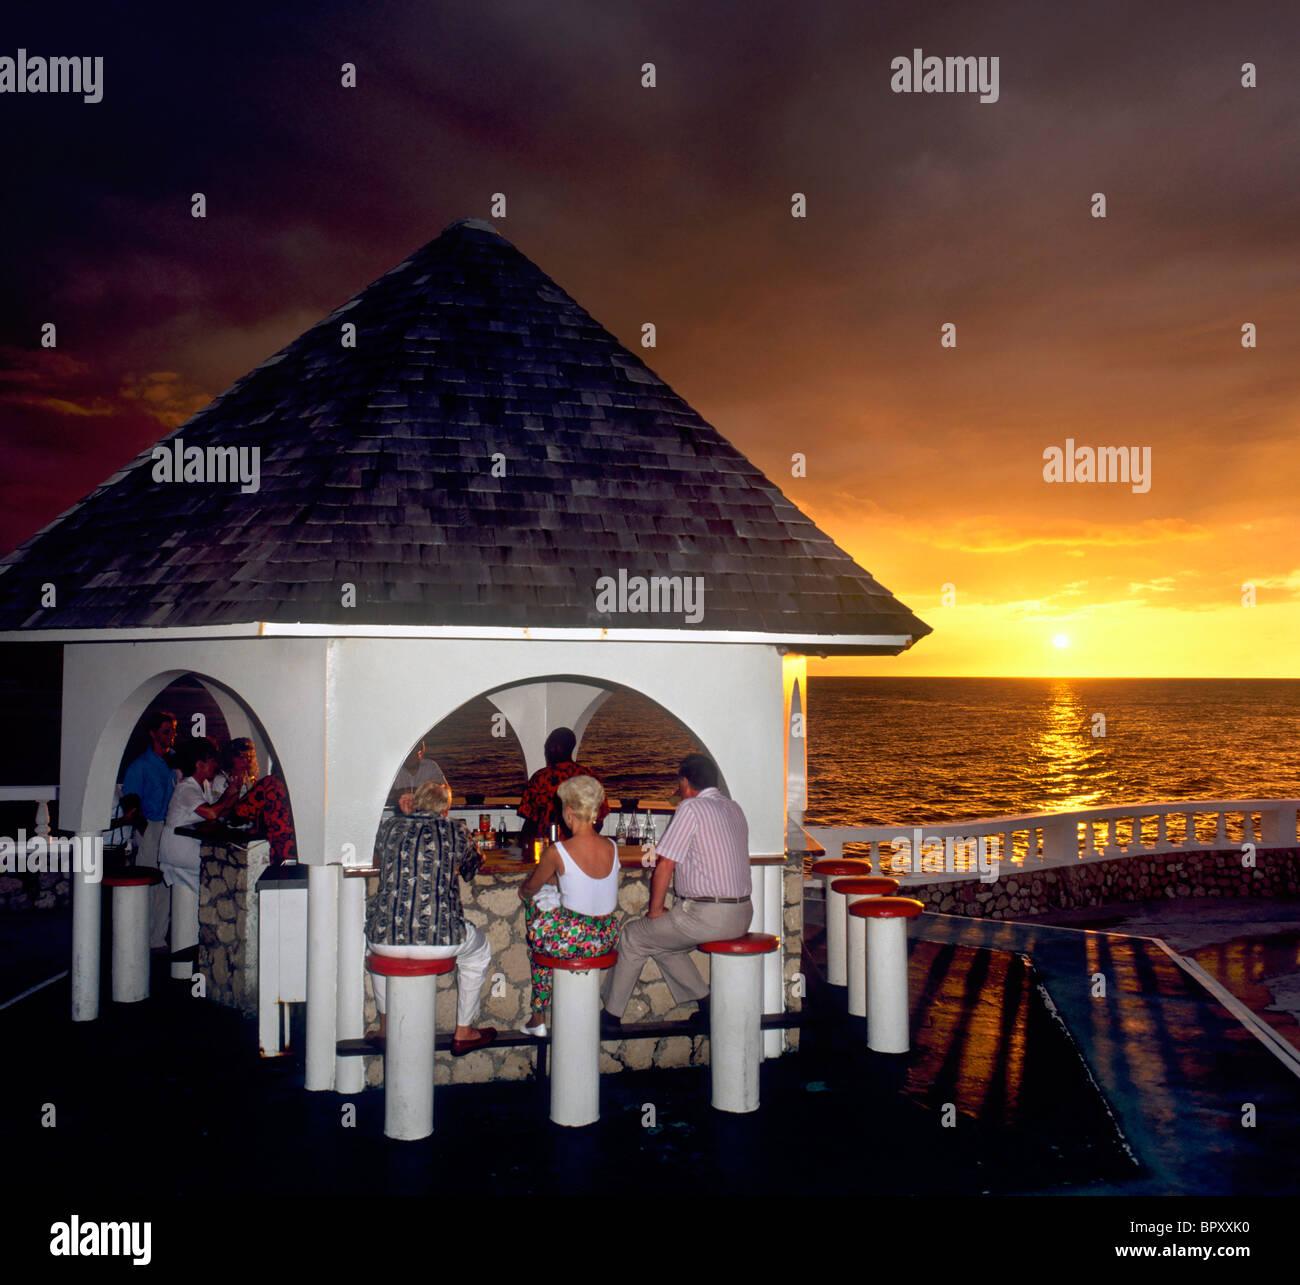 Bar in piscina al tramonto, Eaton Hall Hotel, Runaway Bay, in Giamaica, Caraibi, West Indies Immagini Stock